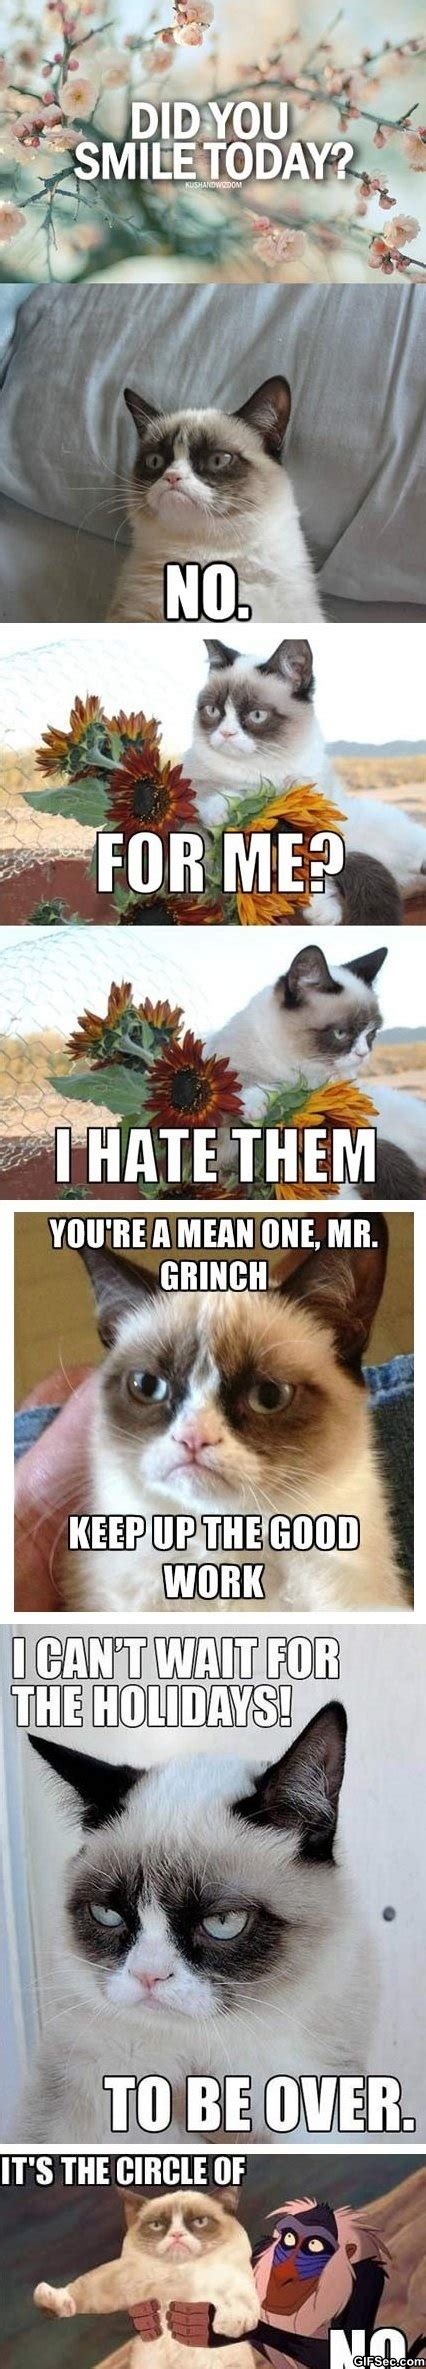 Best Of Grumpy Cat Meme - meme best of grumpy cat